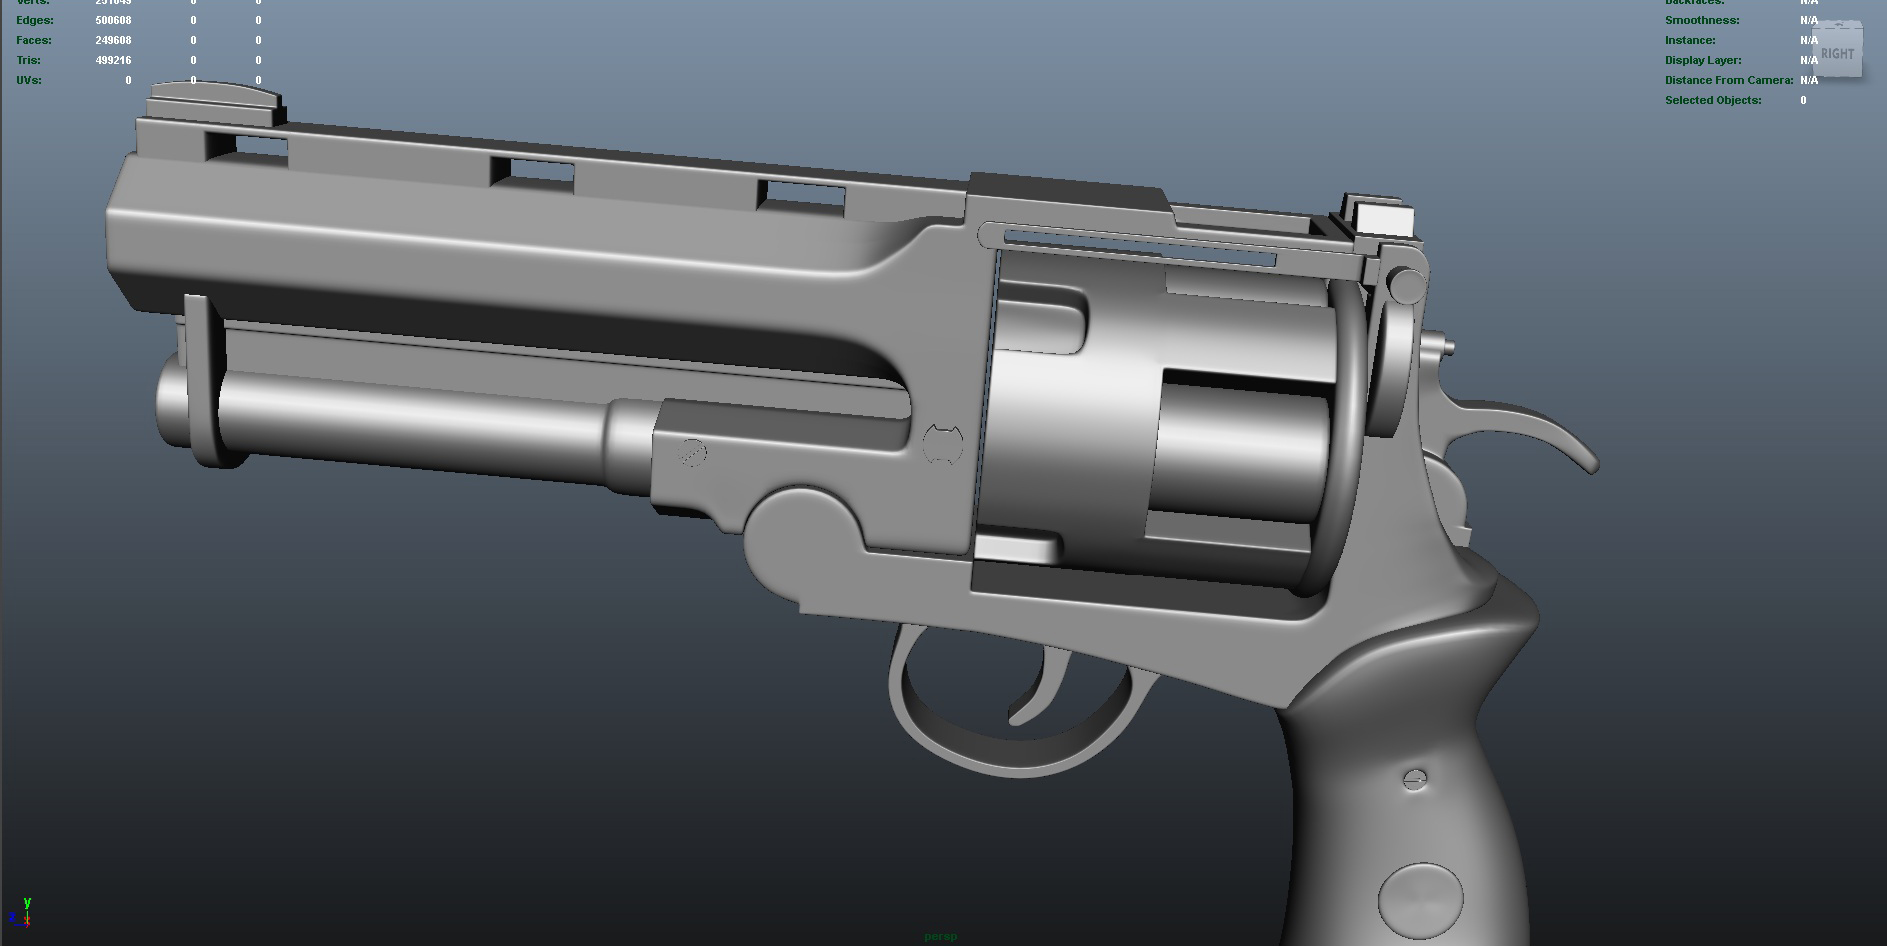 gun 3d model fbx dae ma mb obj 153248